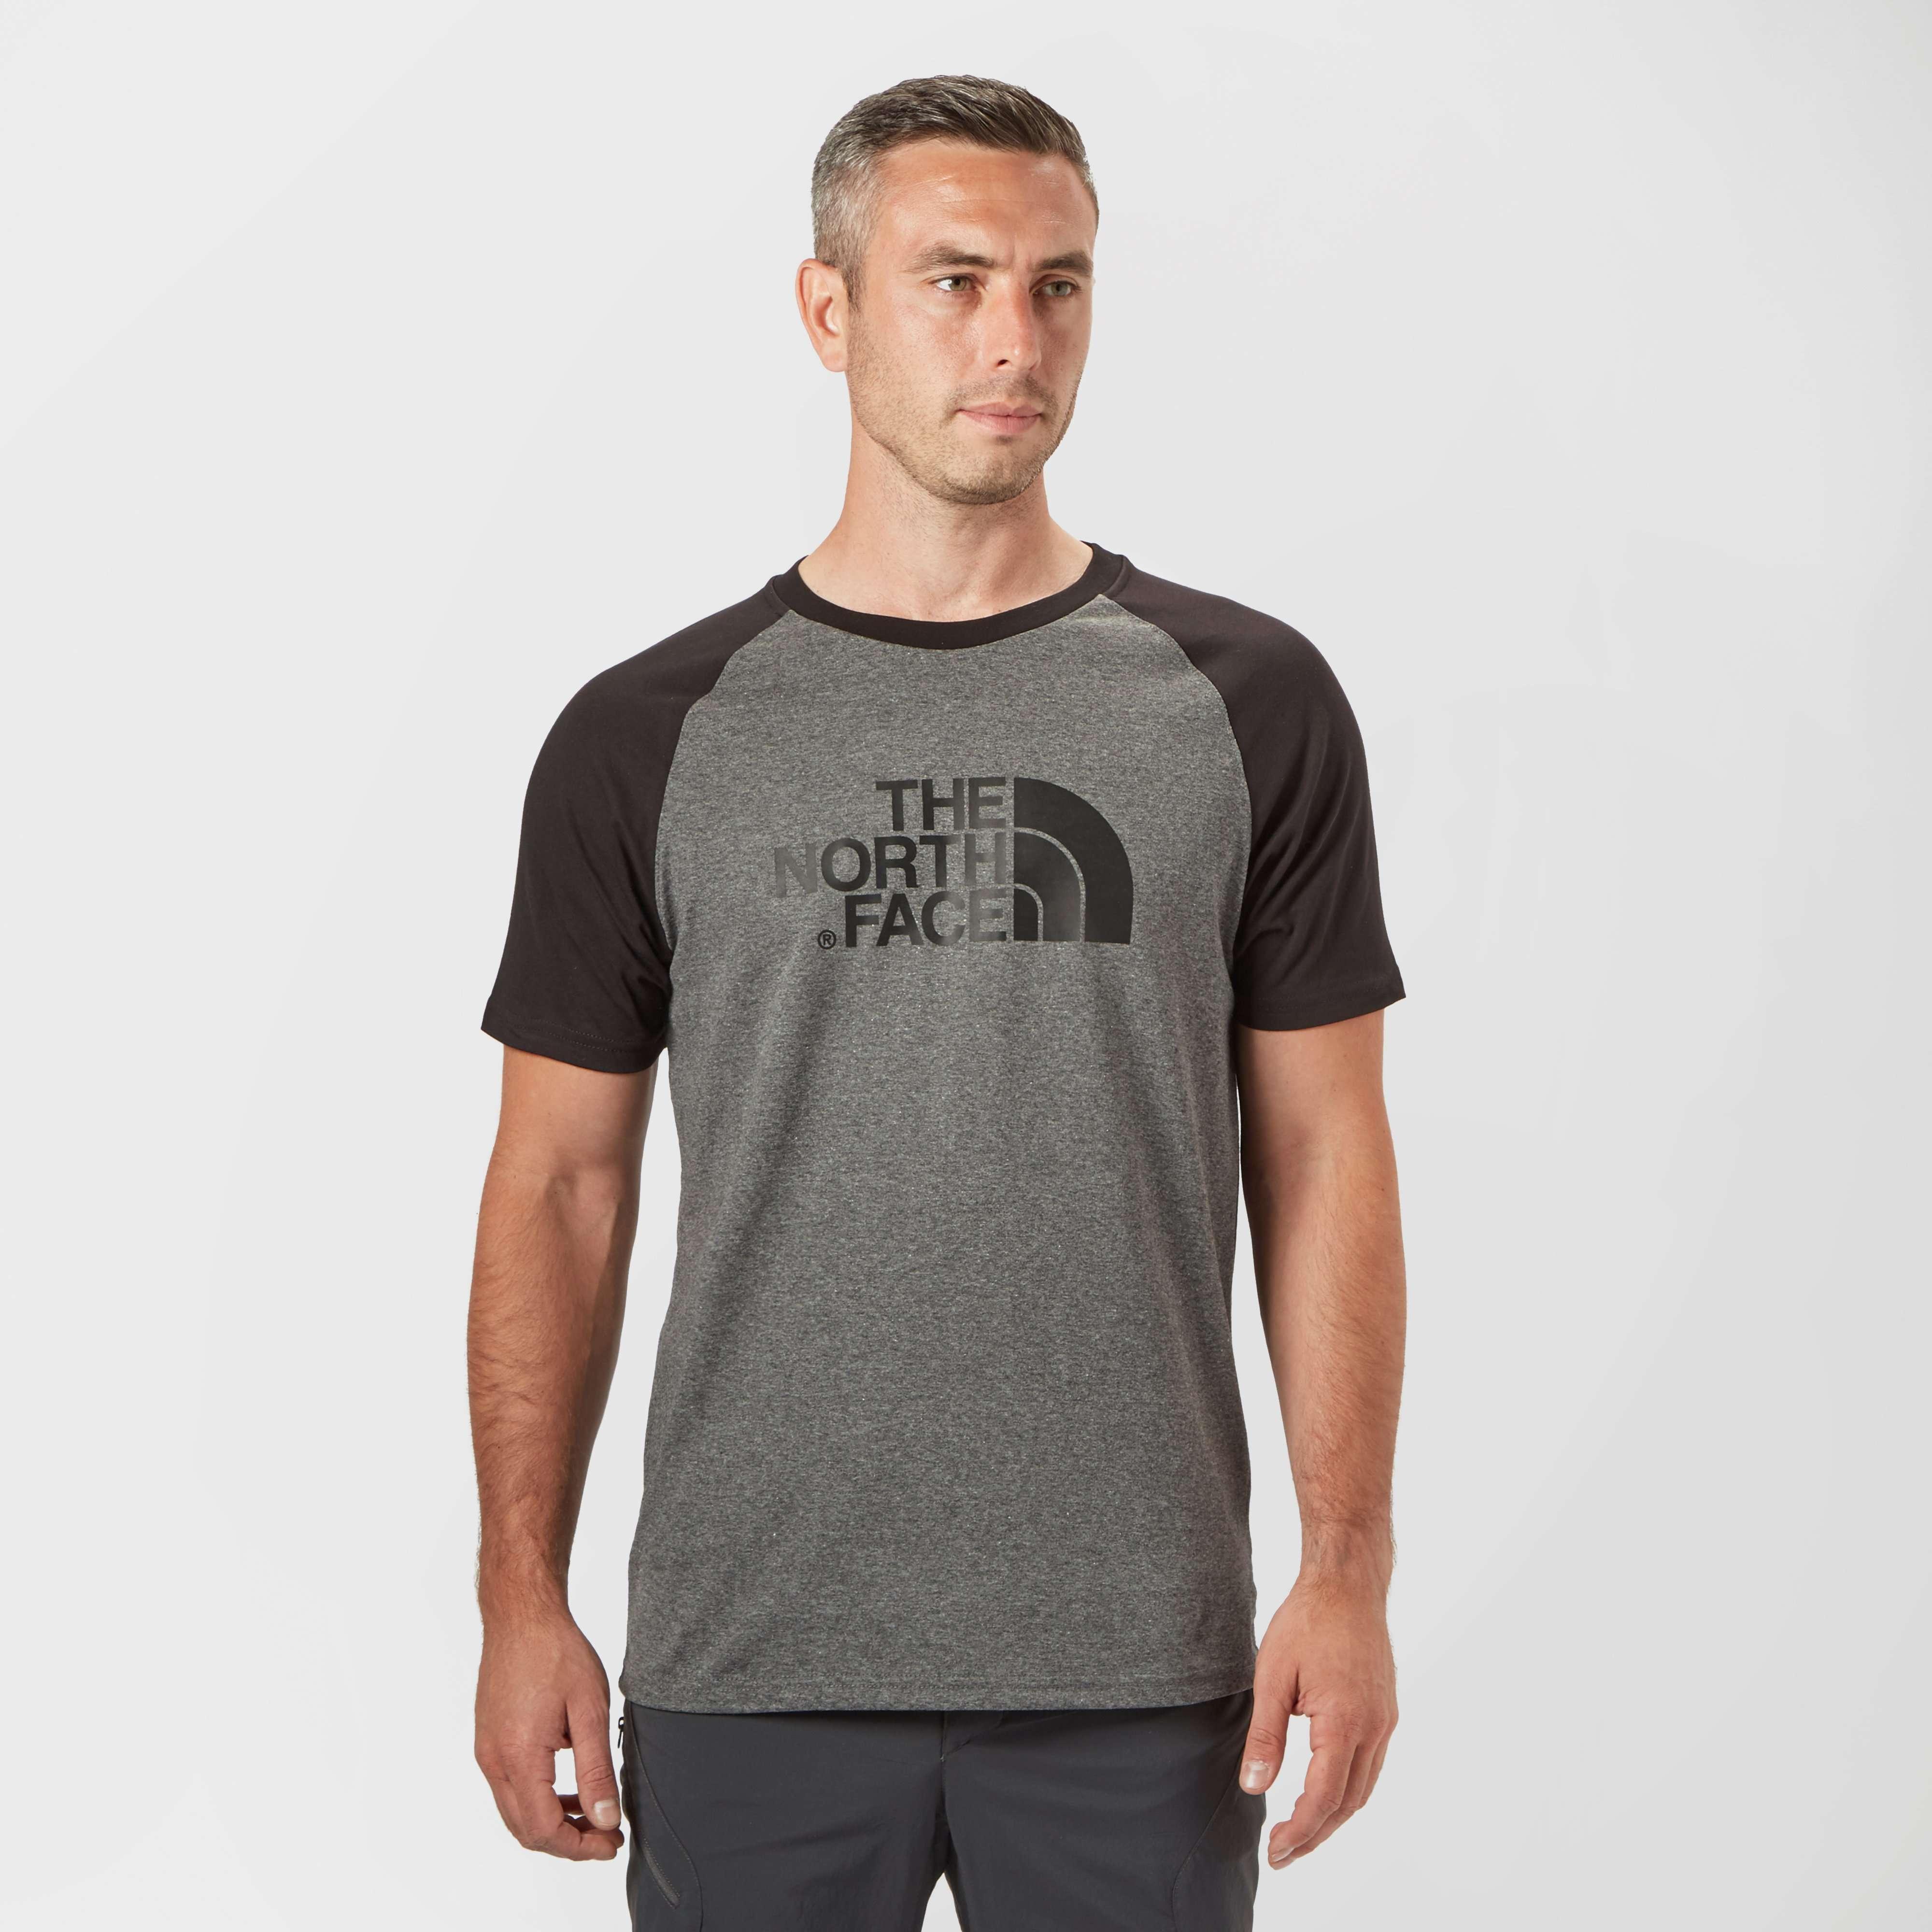 THE NORTH FACE Men's Raglan Easy T-Shirt